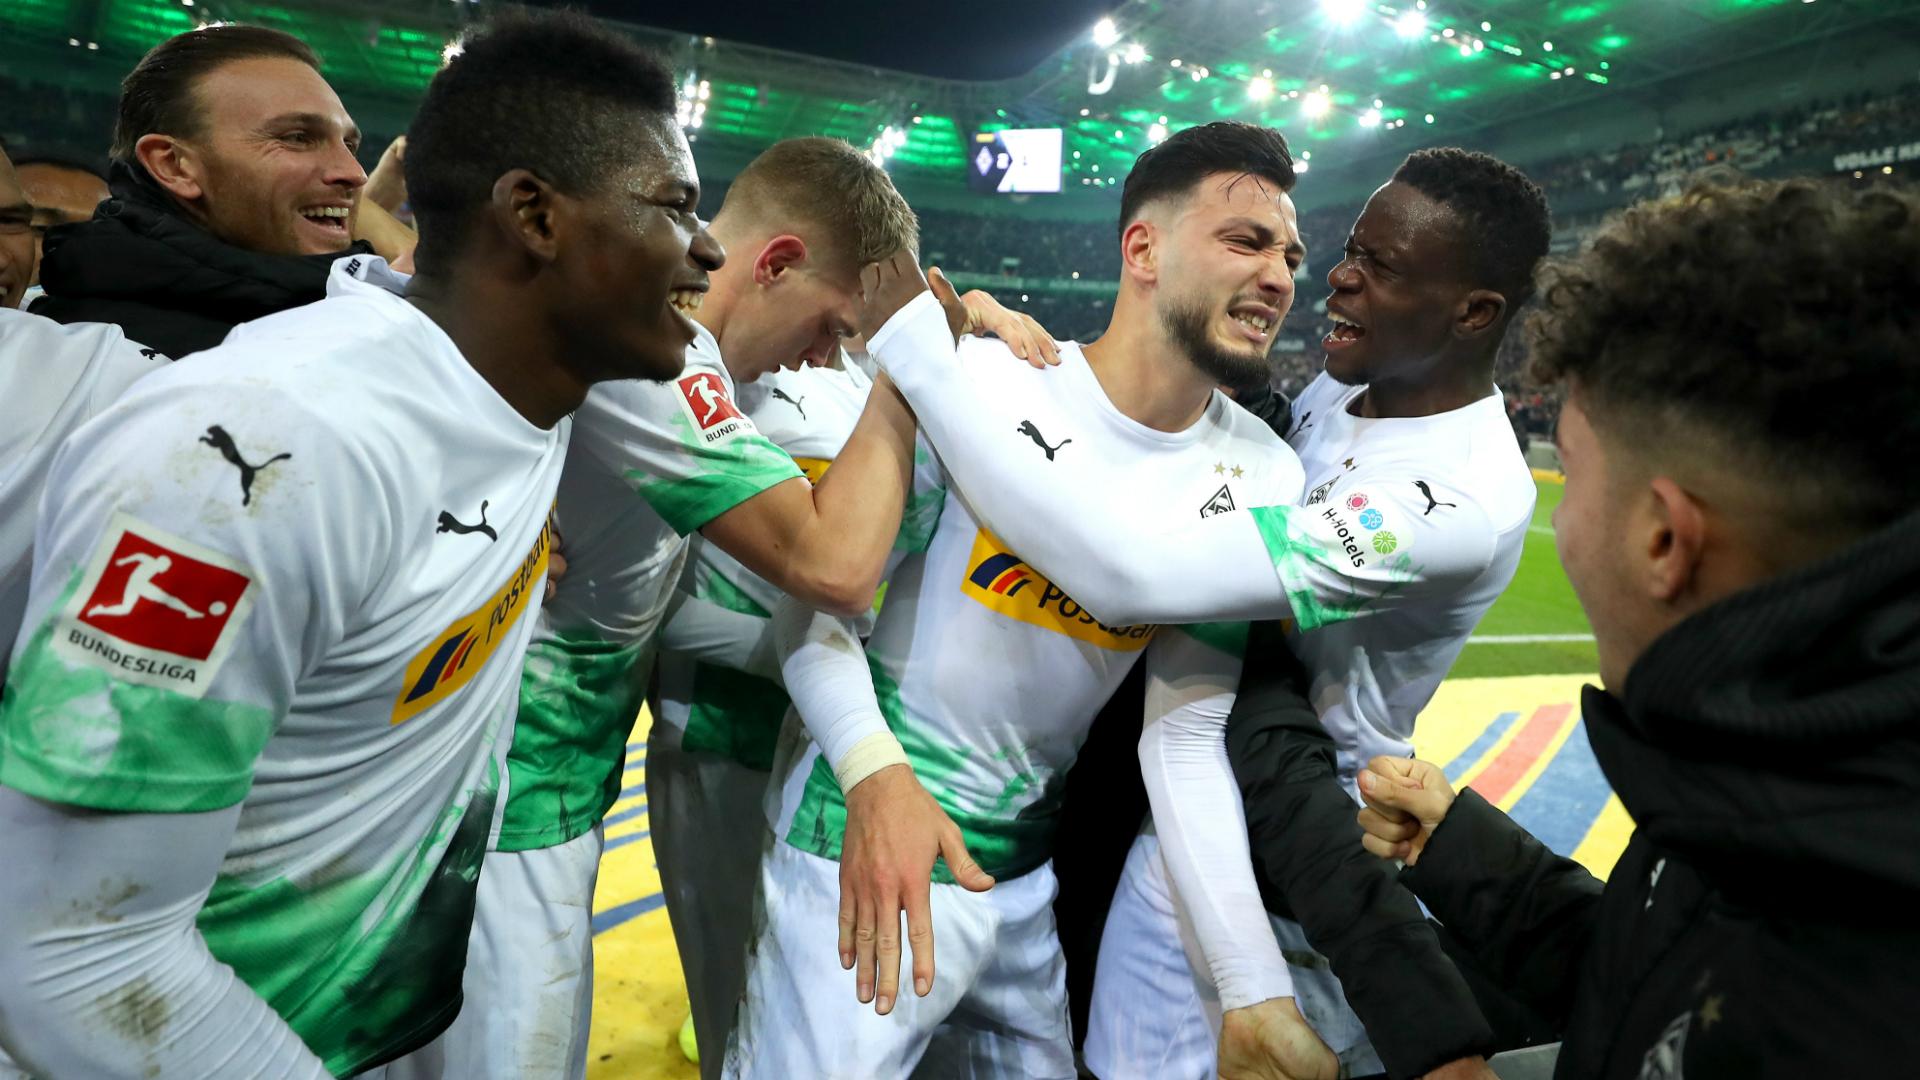 Algeria's Bensebaini scores brace as Borussia Monchengladbach fight back to defeat Bayern Munich